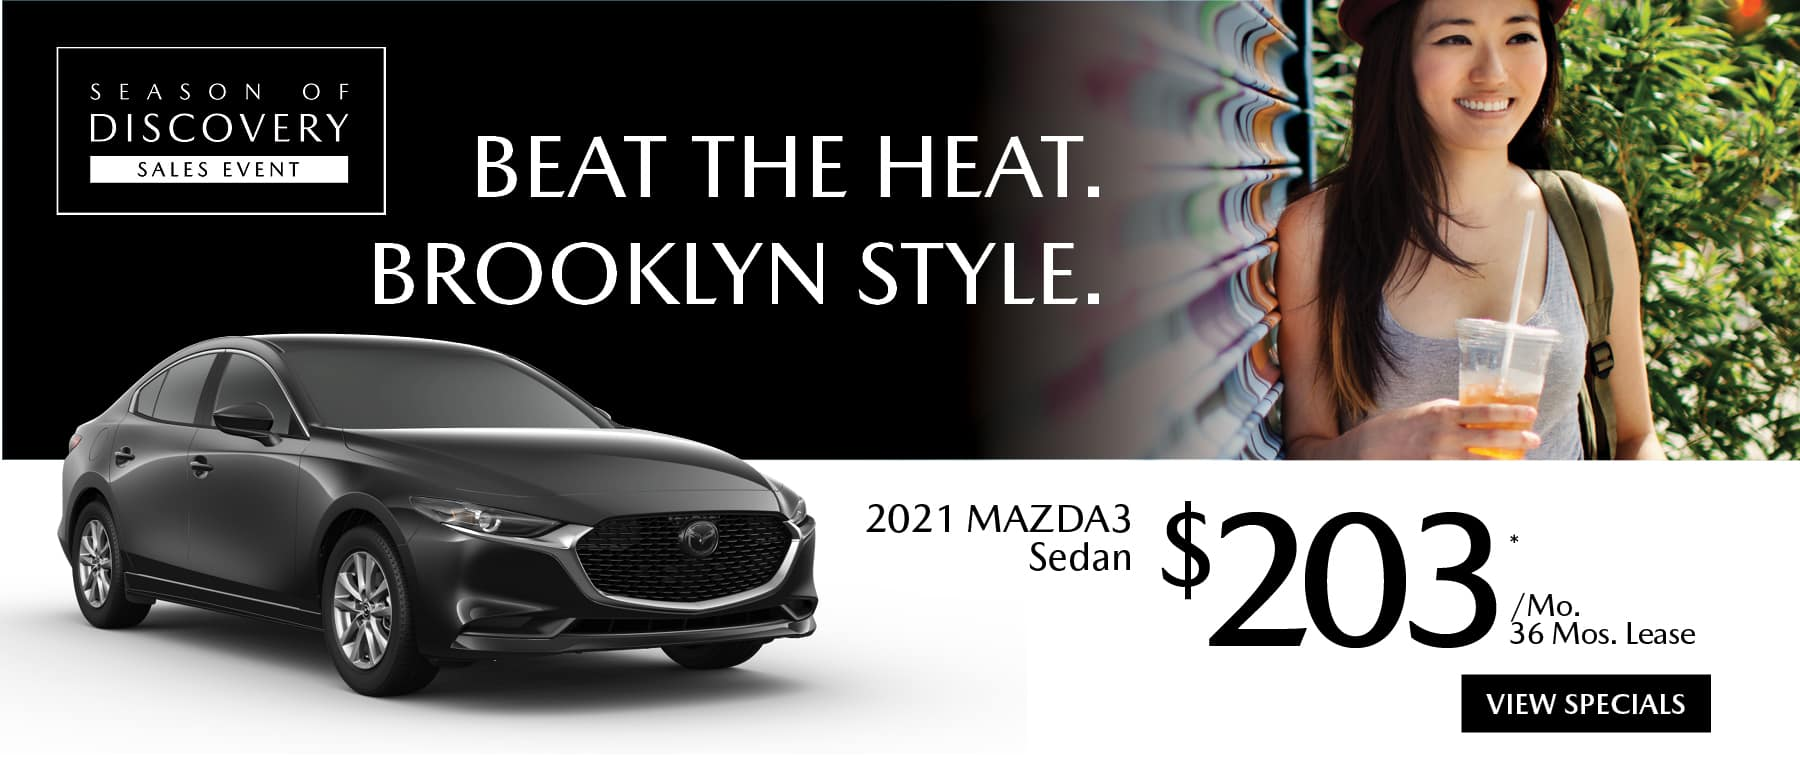 BRMA-1491 Beat Heat 1800x760_Mazda3